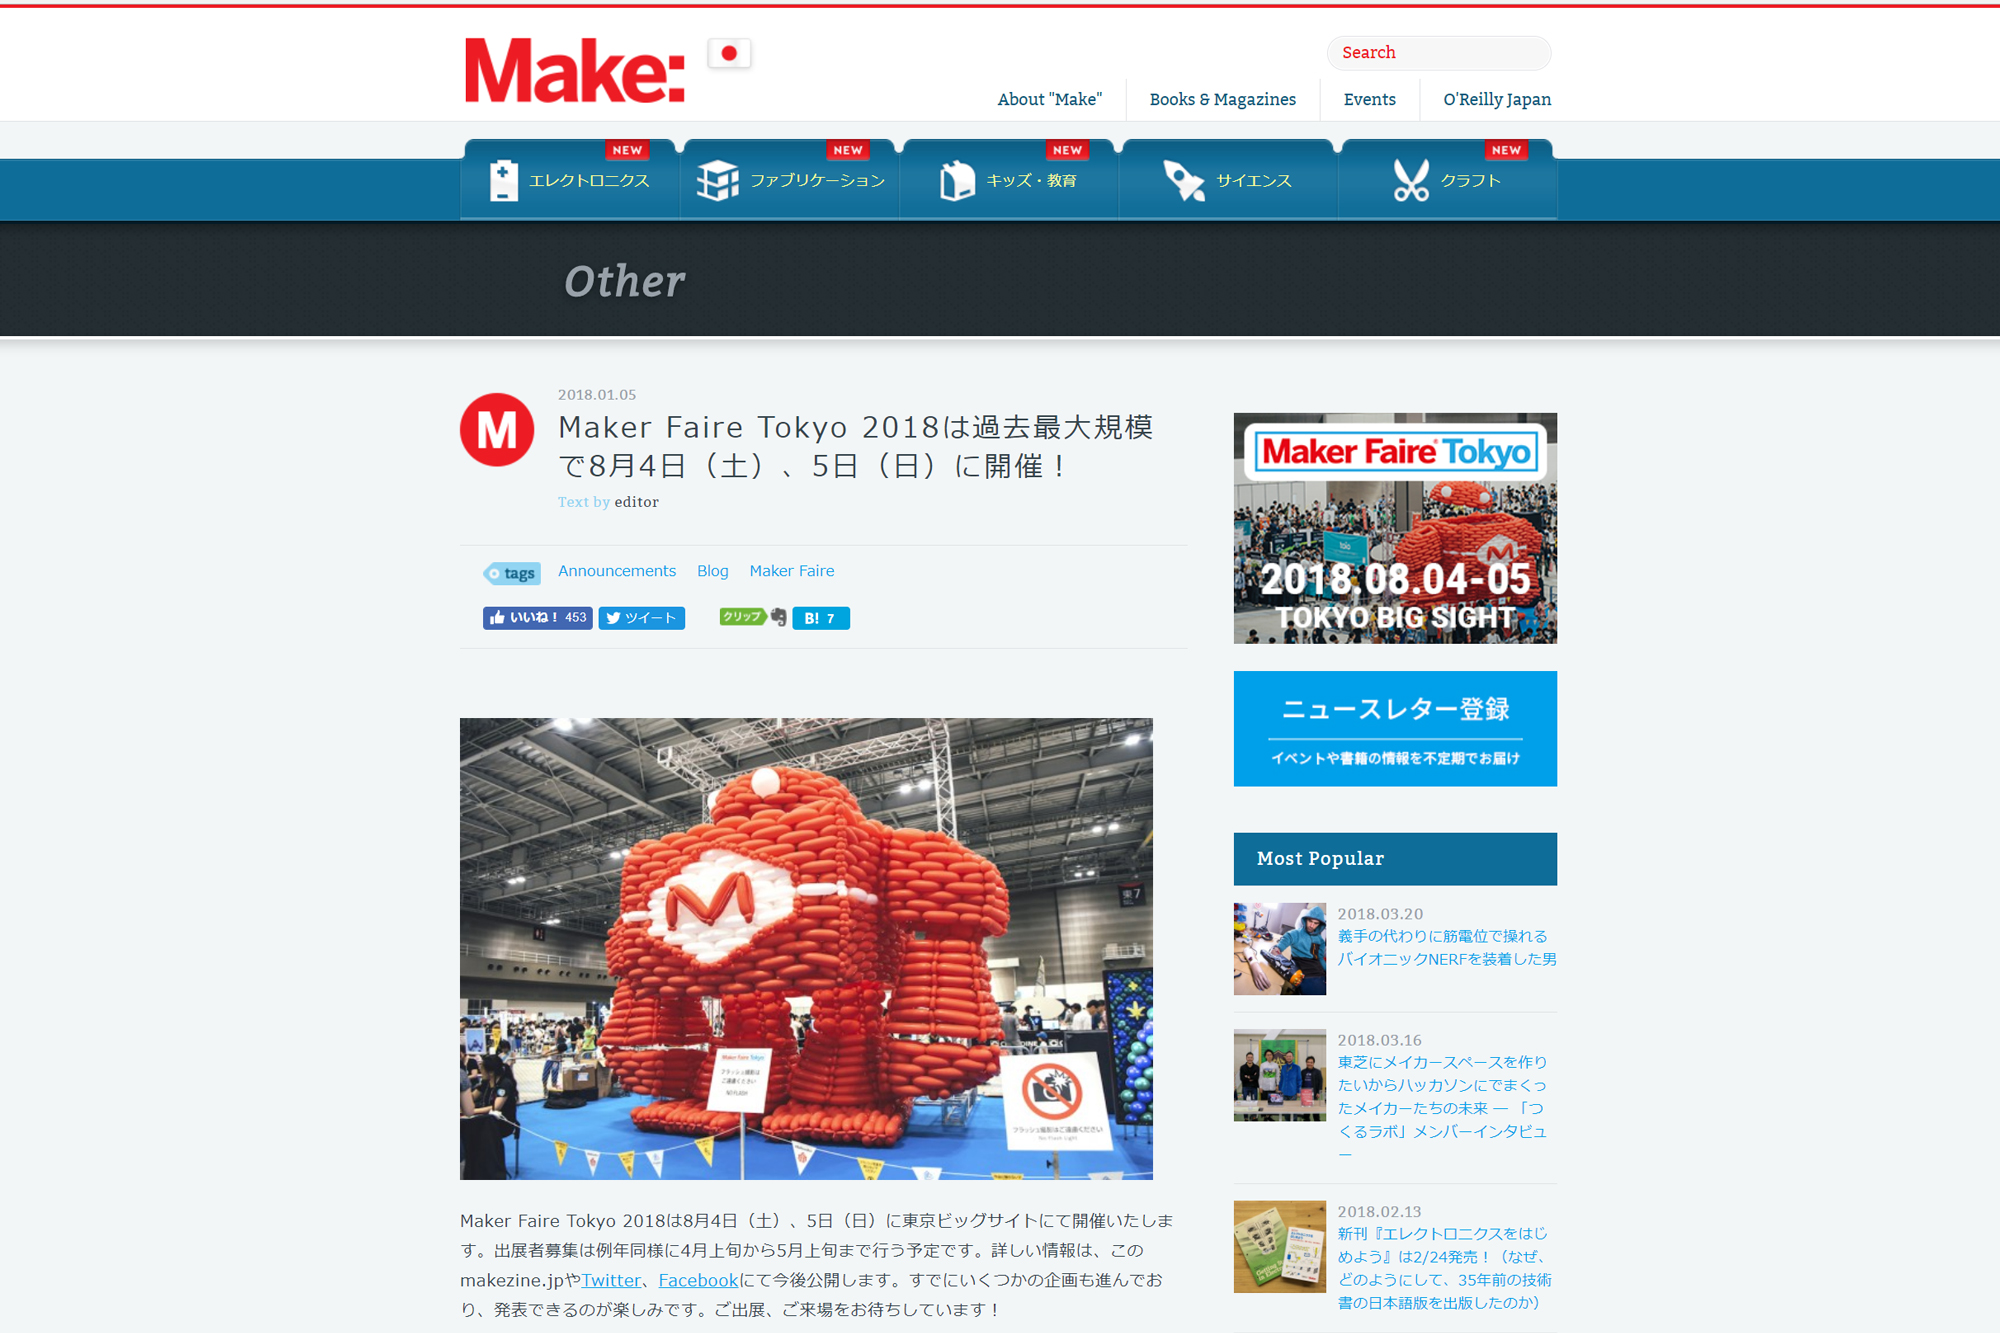 「Maker Faire Tokyo 2018」開催告知記事より